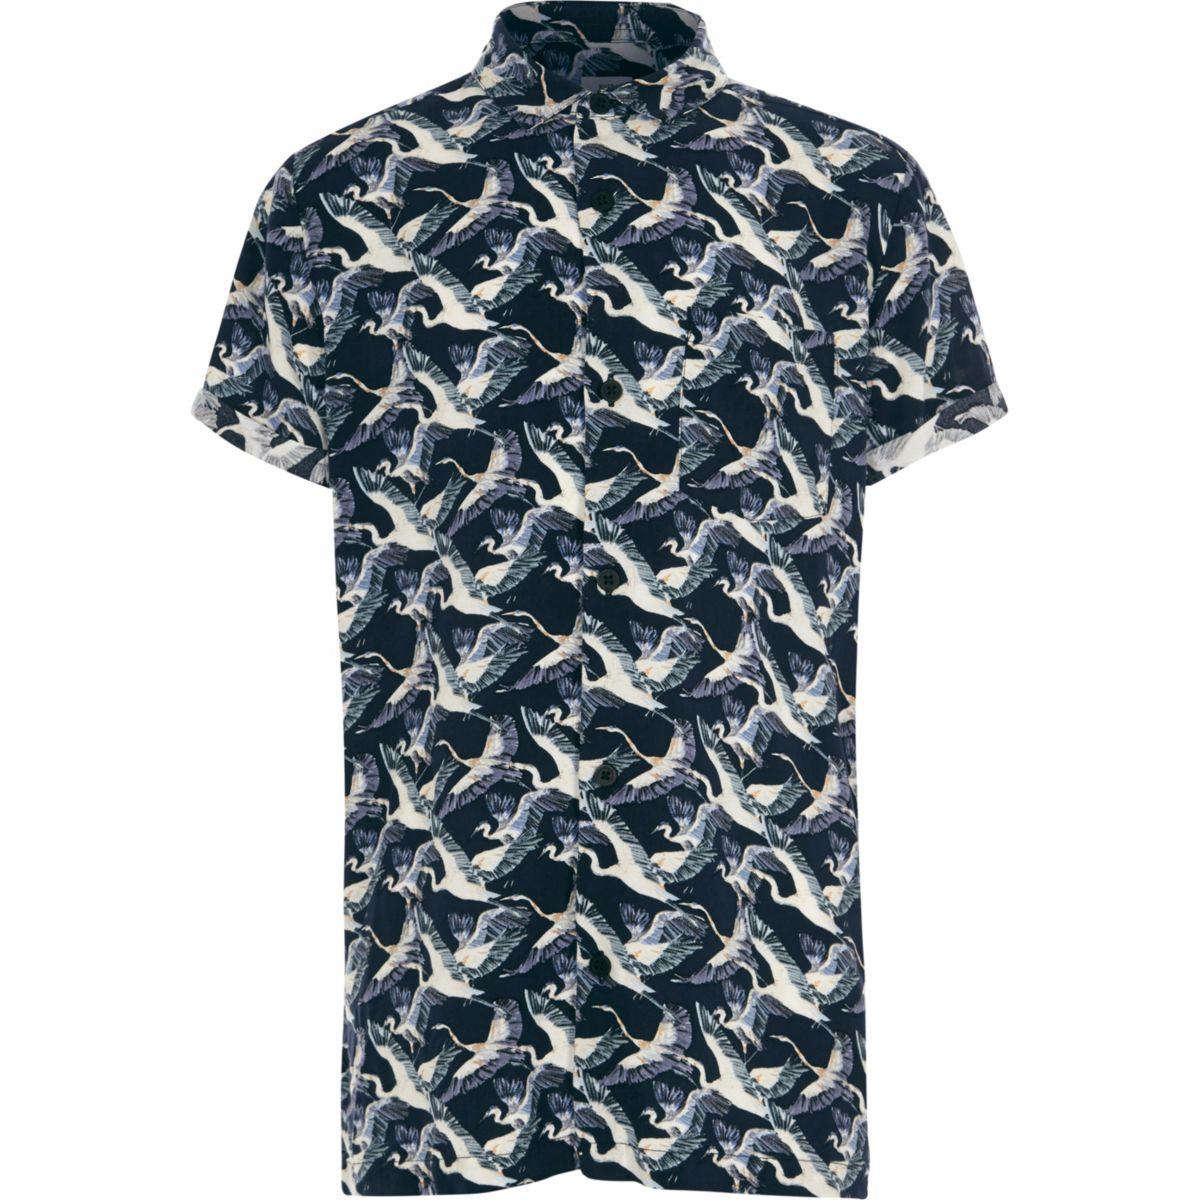 Boys navy crane bird print short sleeve shirt